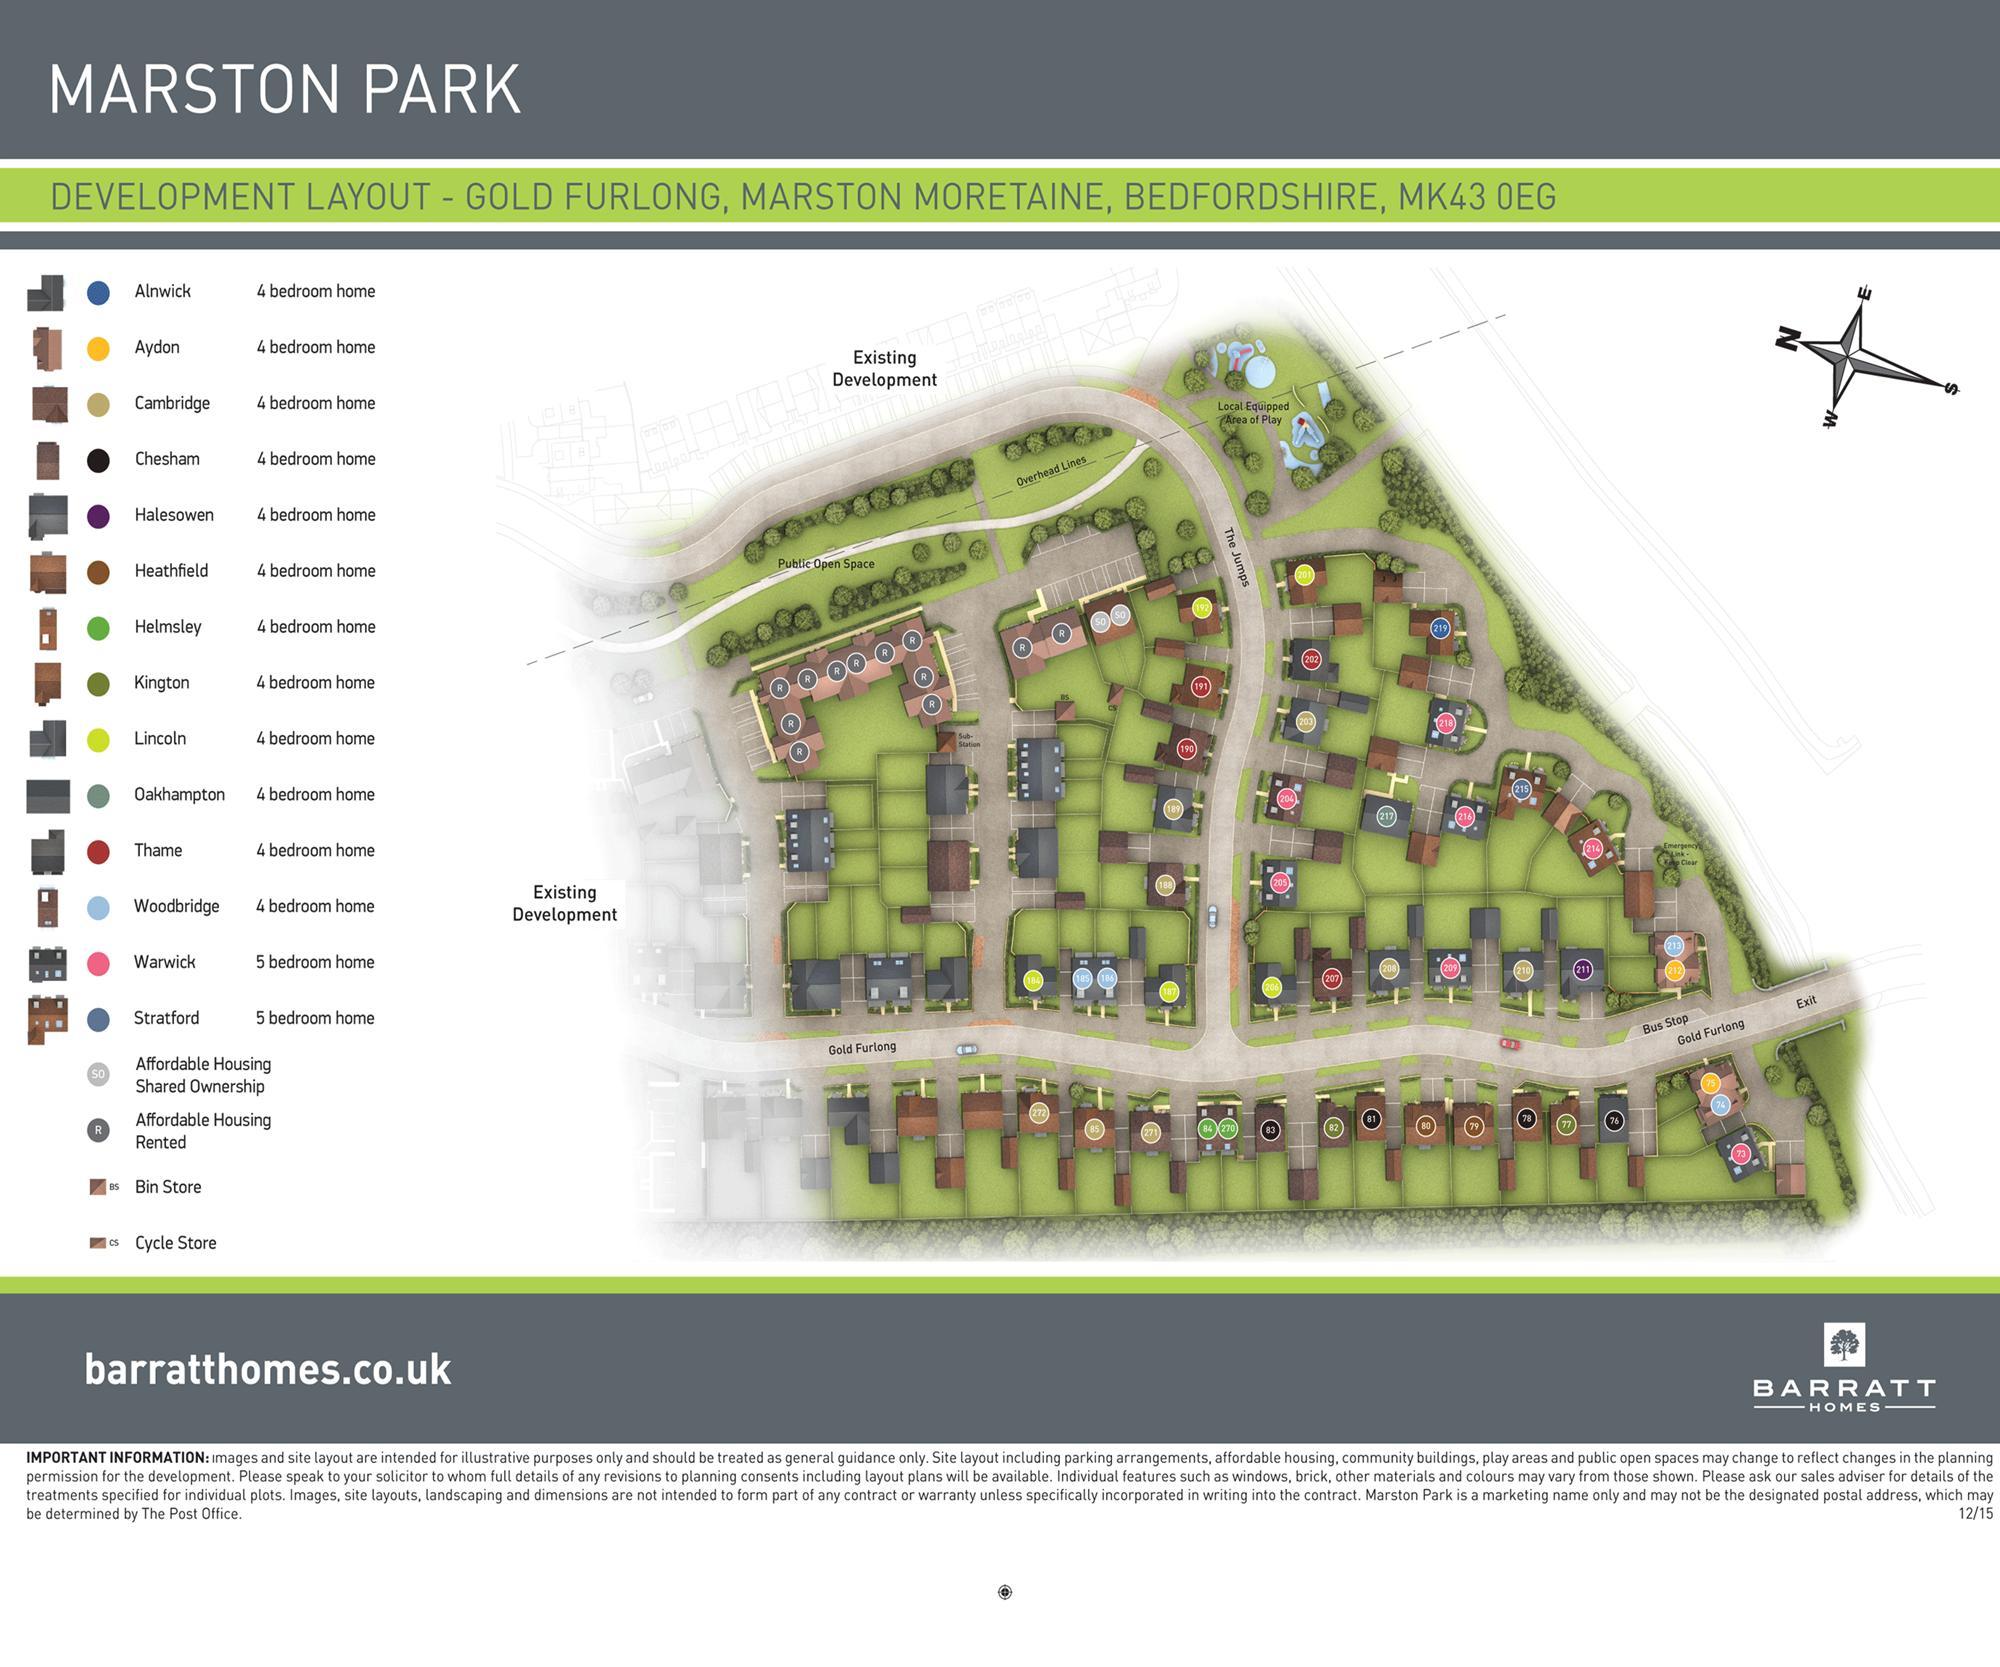 Marston Park ph2 (coming soon) site plan